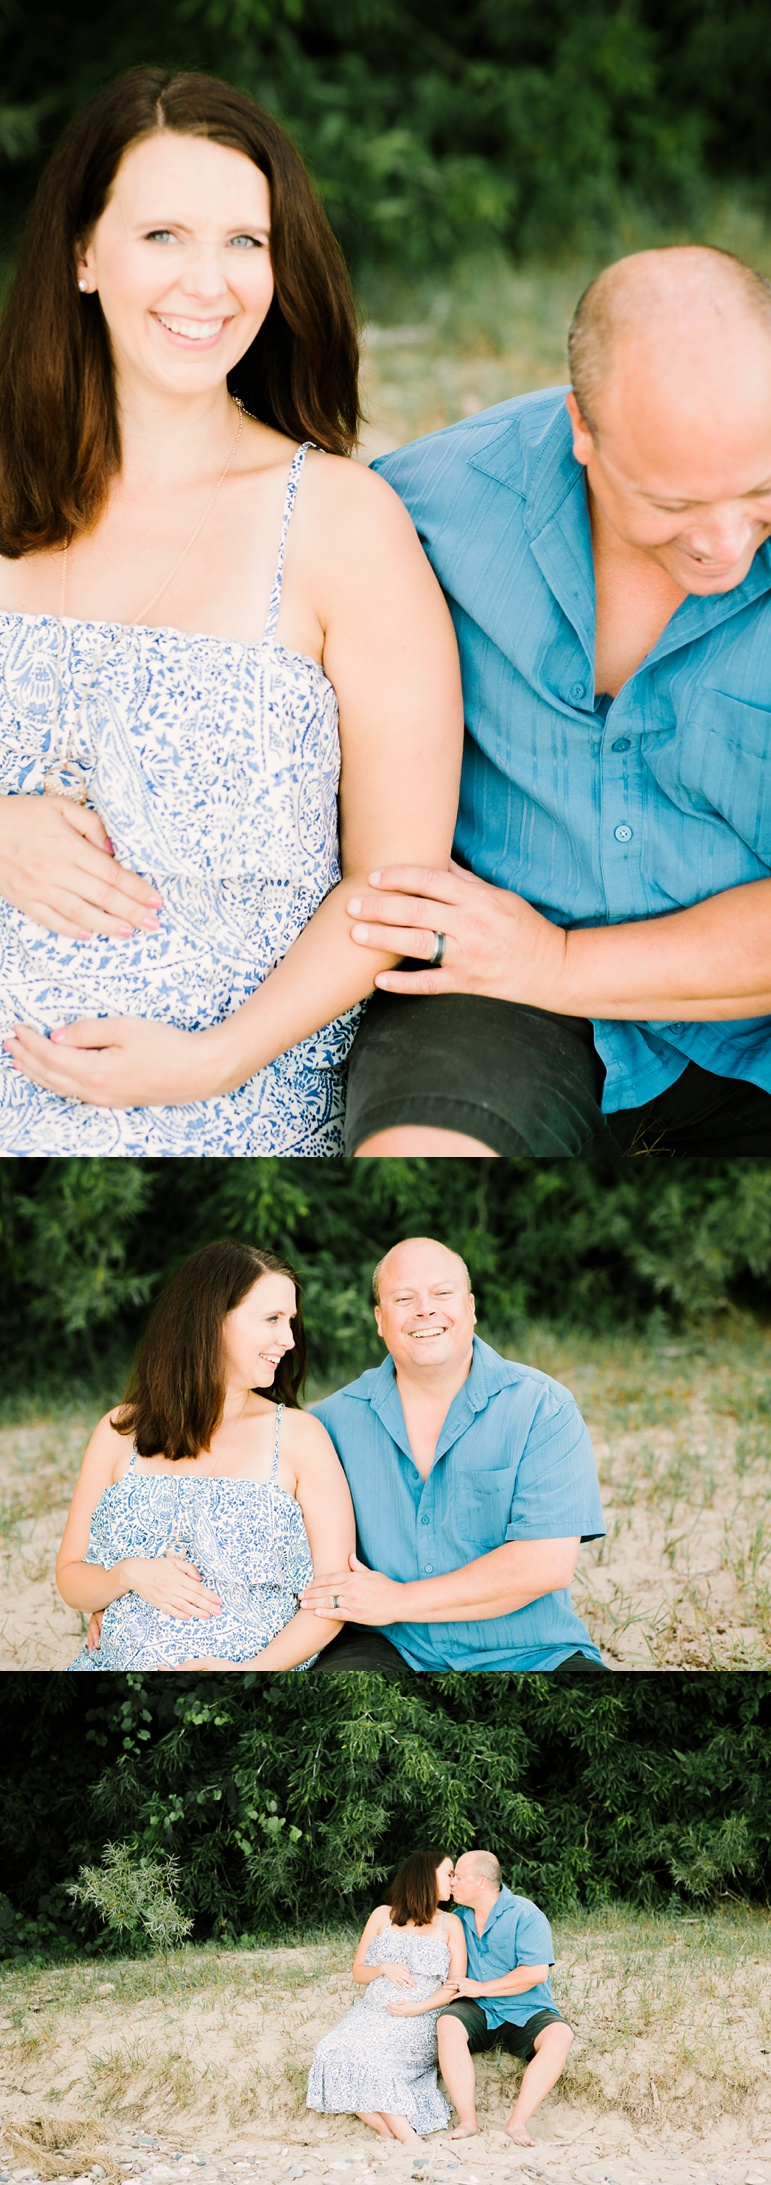 Milwaukee WI Wedding Photographers, Green Bay WI Wedding, Karen Ann Photography, Door County, Denver Wedding Photographers, Beach Maternity Session, Milwaukee Doctor's Park